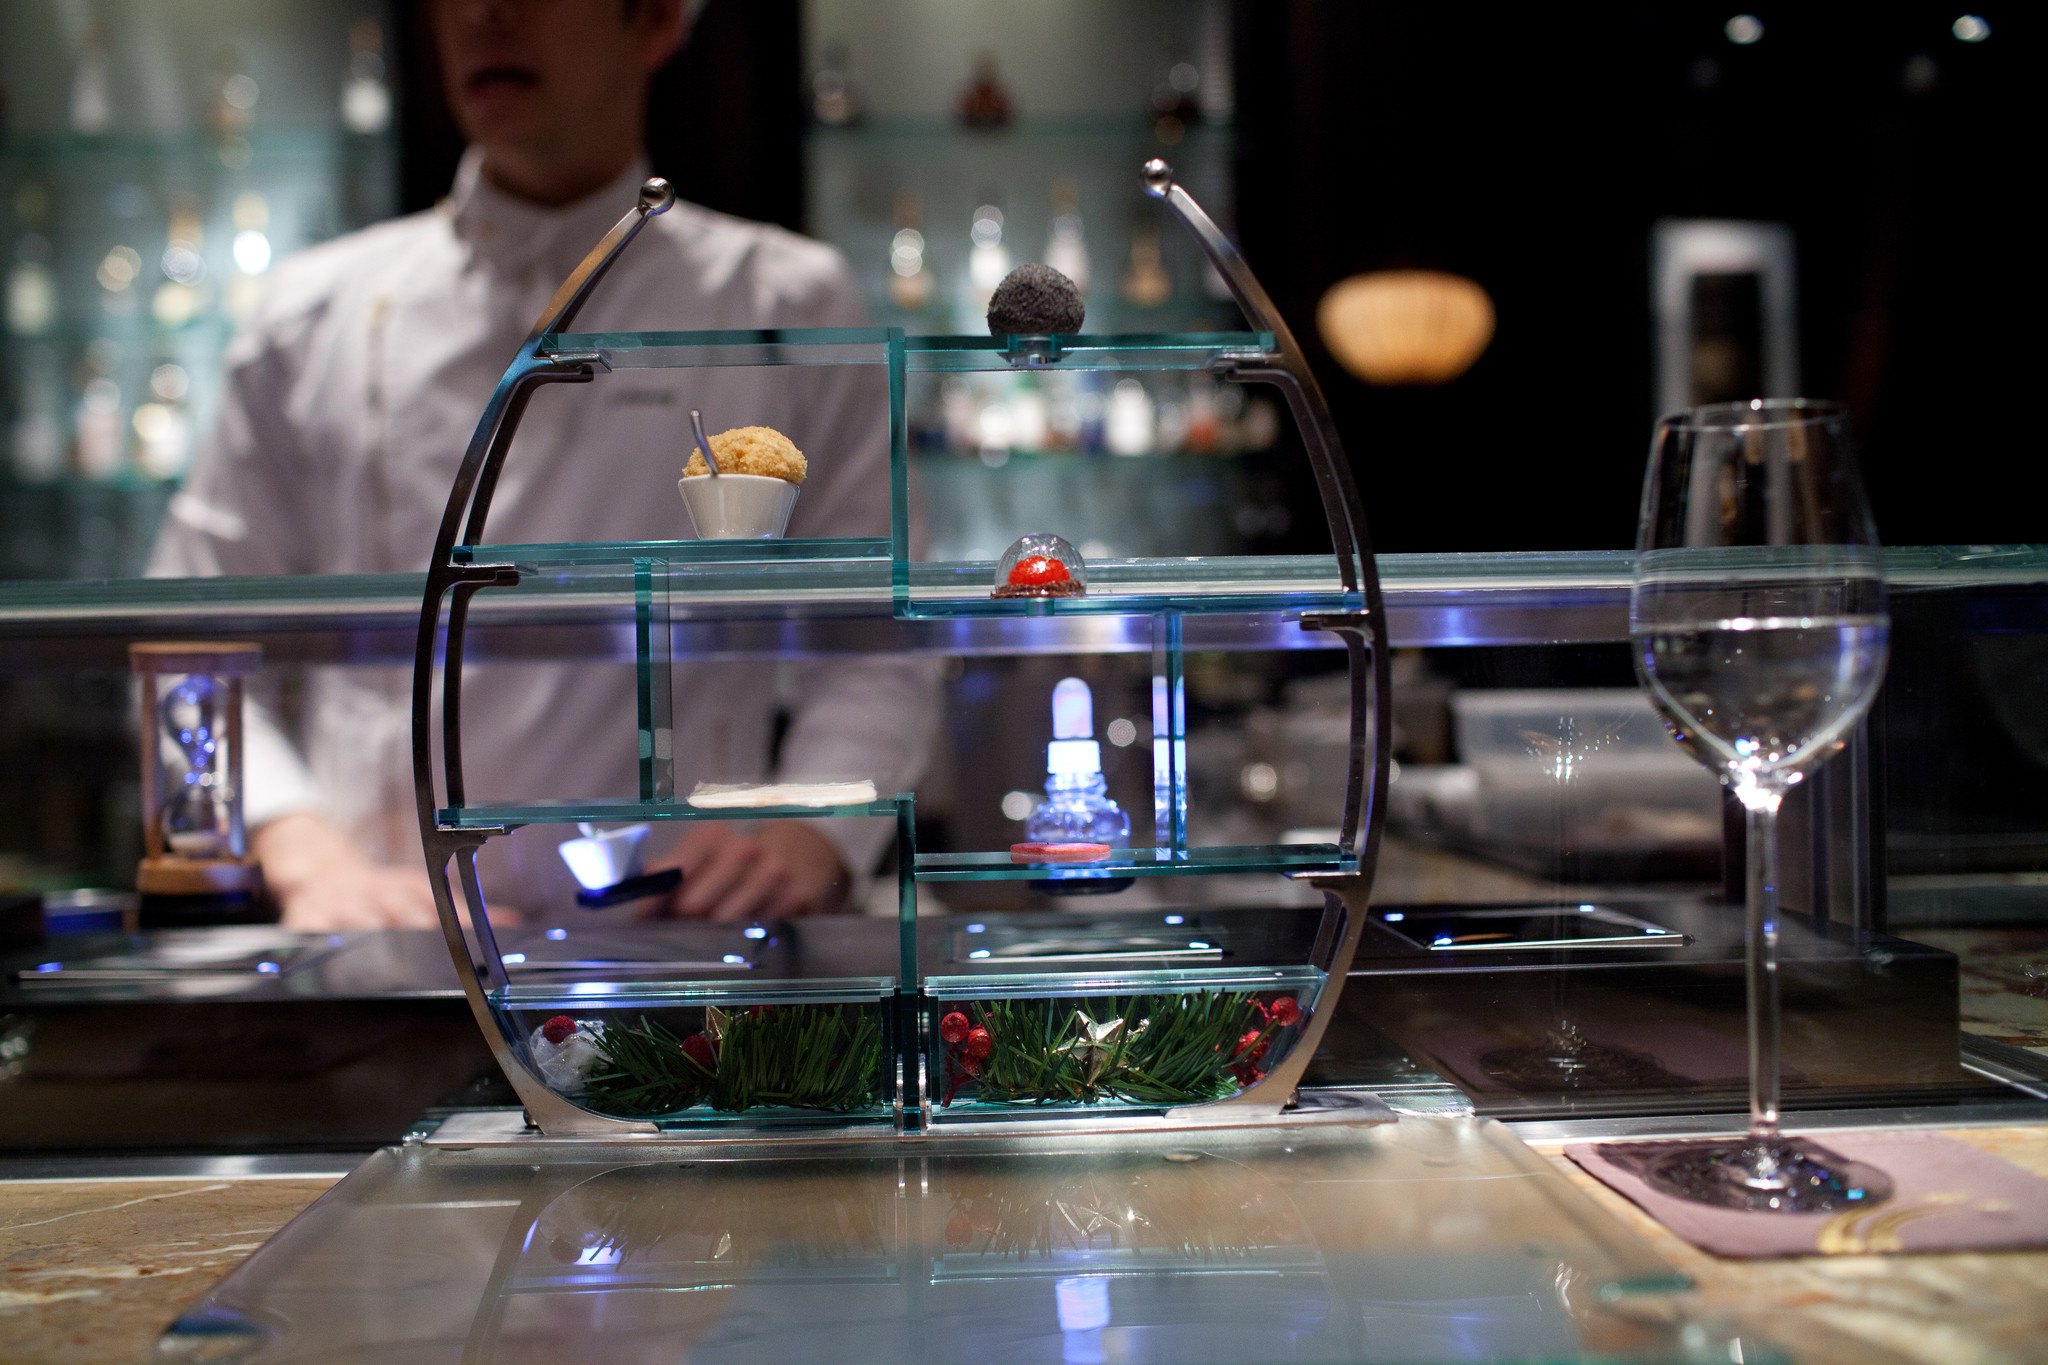 Tapas Molecular Bar, Tokyo - Mont Blanc, Chocolate Truffles, Sacher Torte, Cinnamon Toast